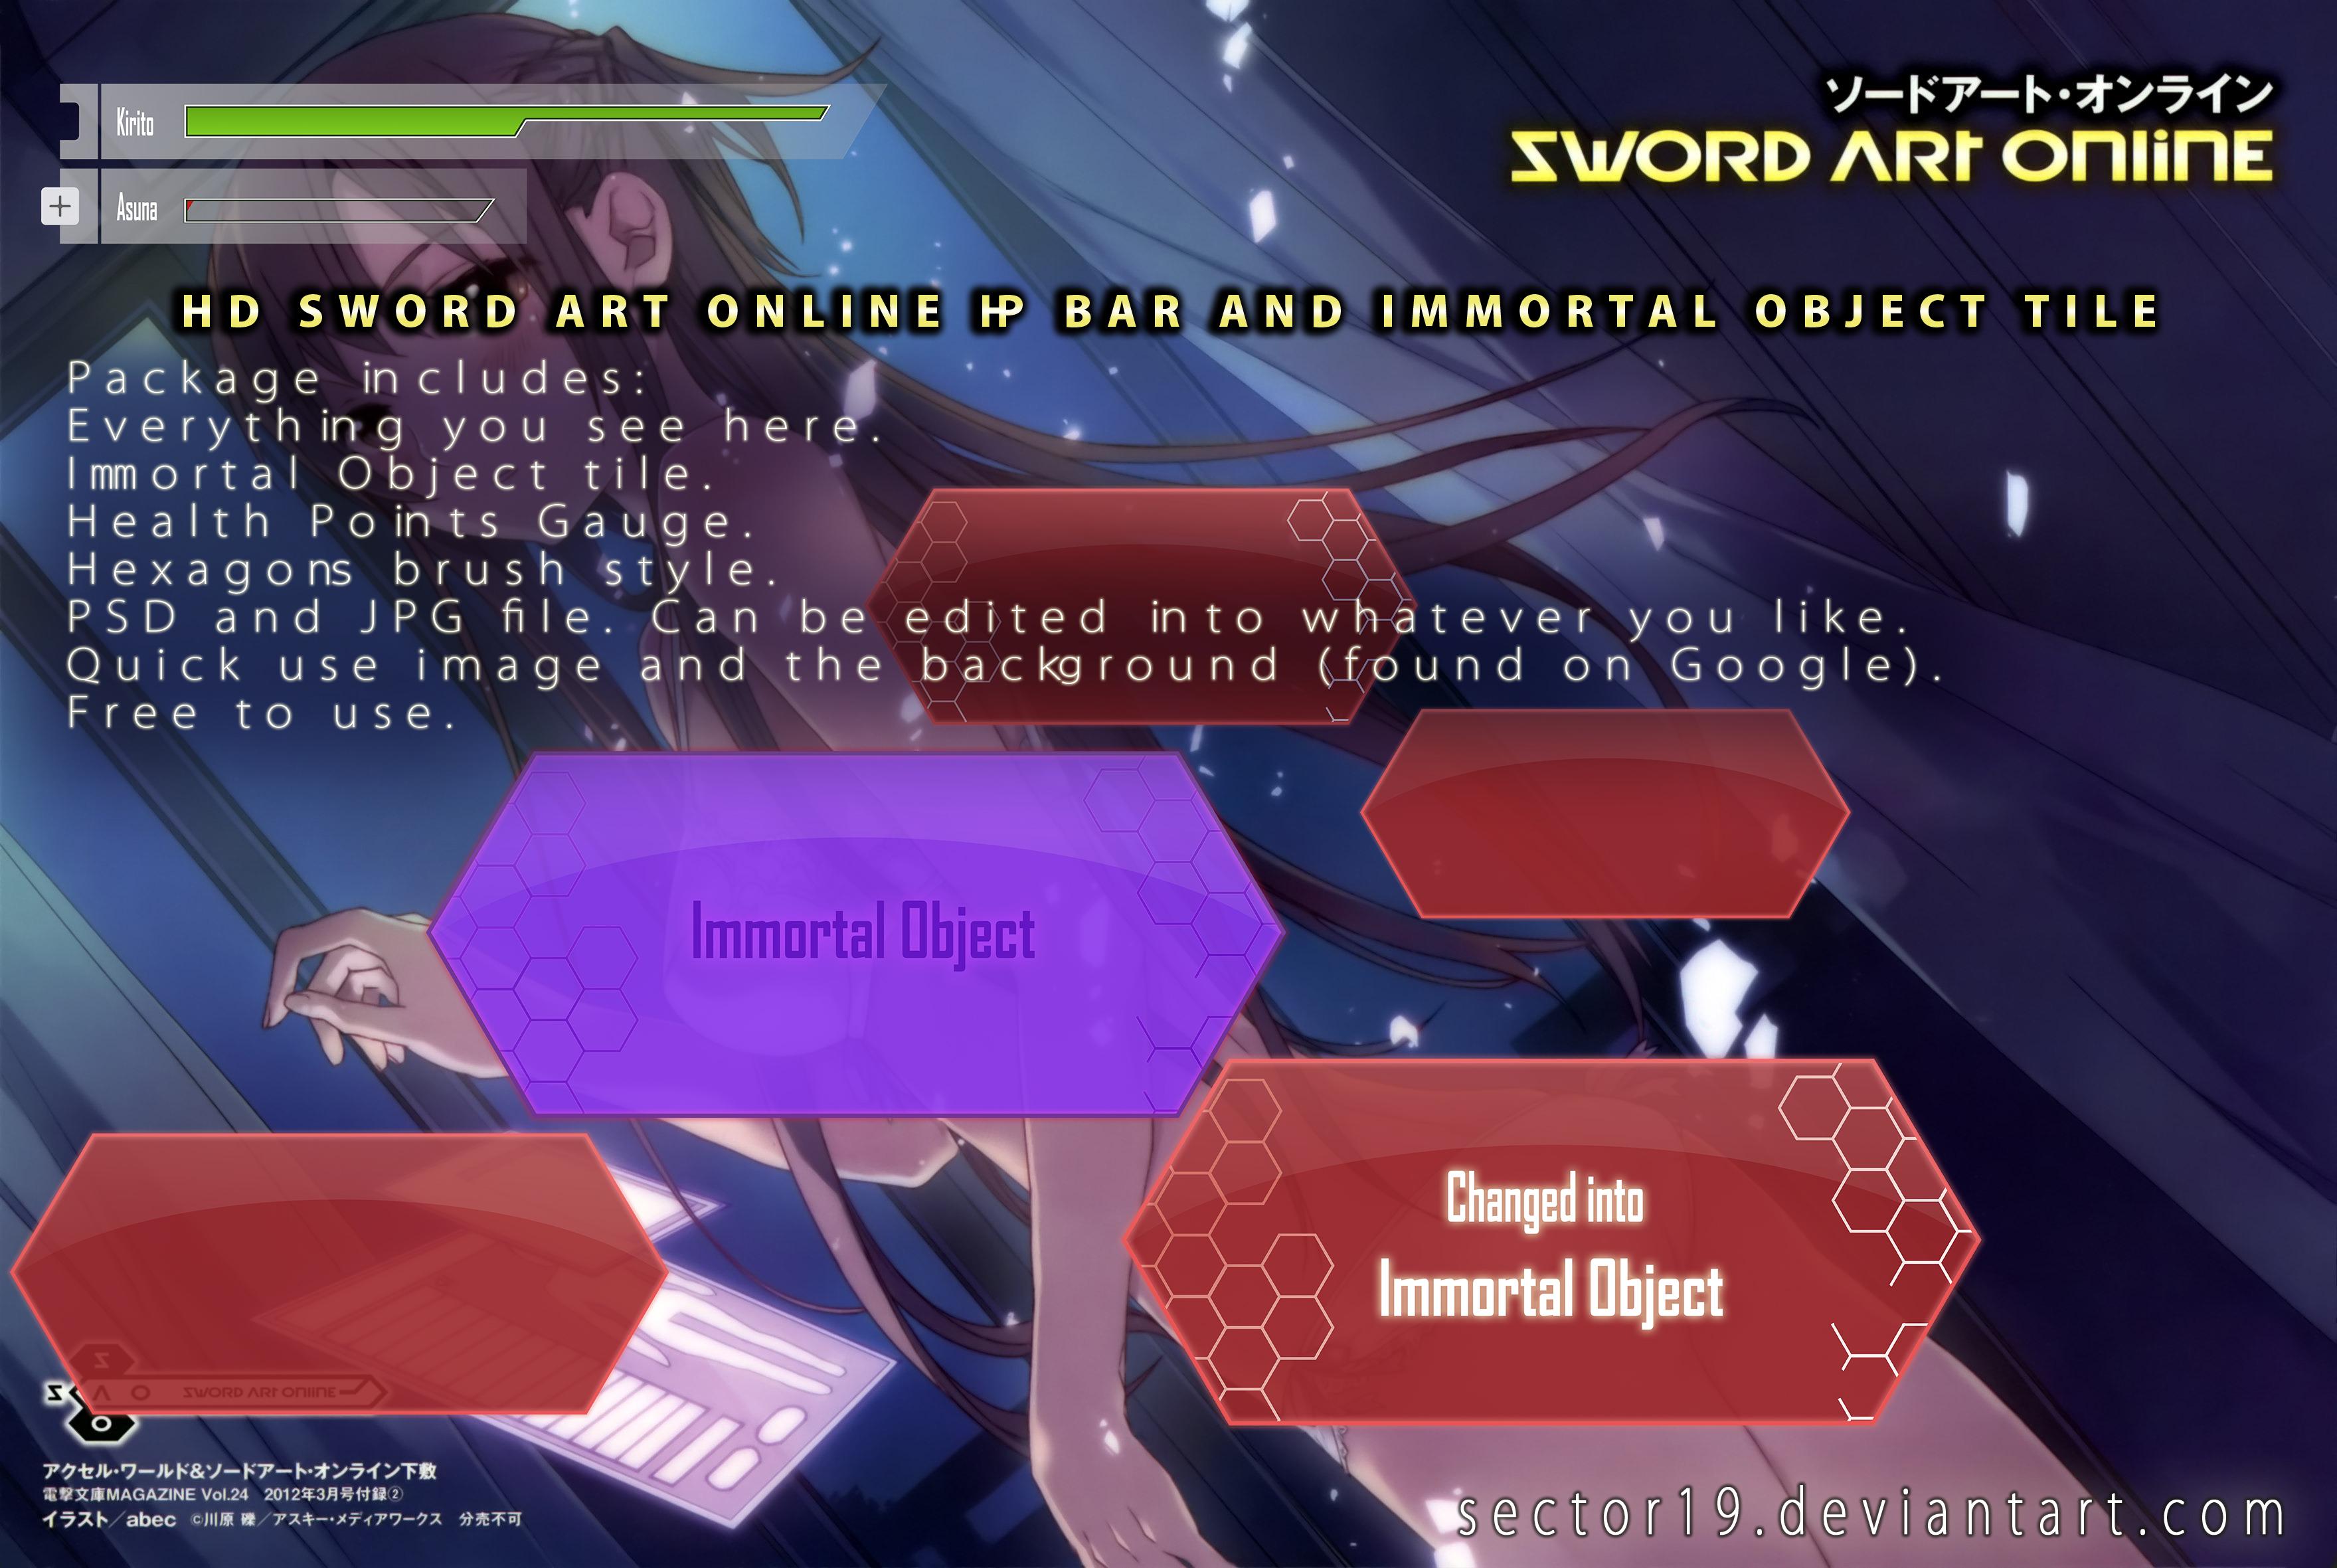 Sword Art Online Gadgets In Hd By Sector